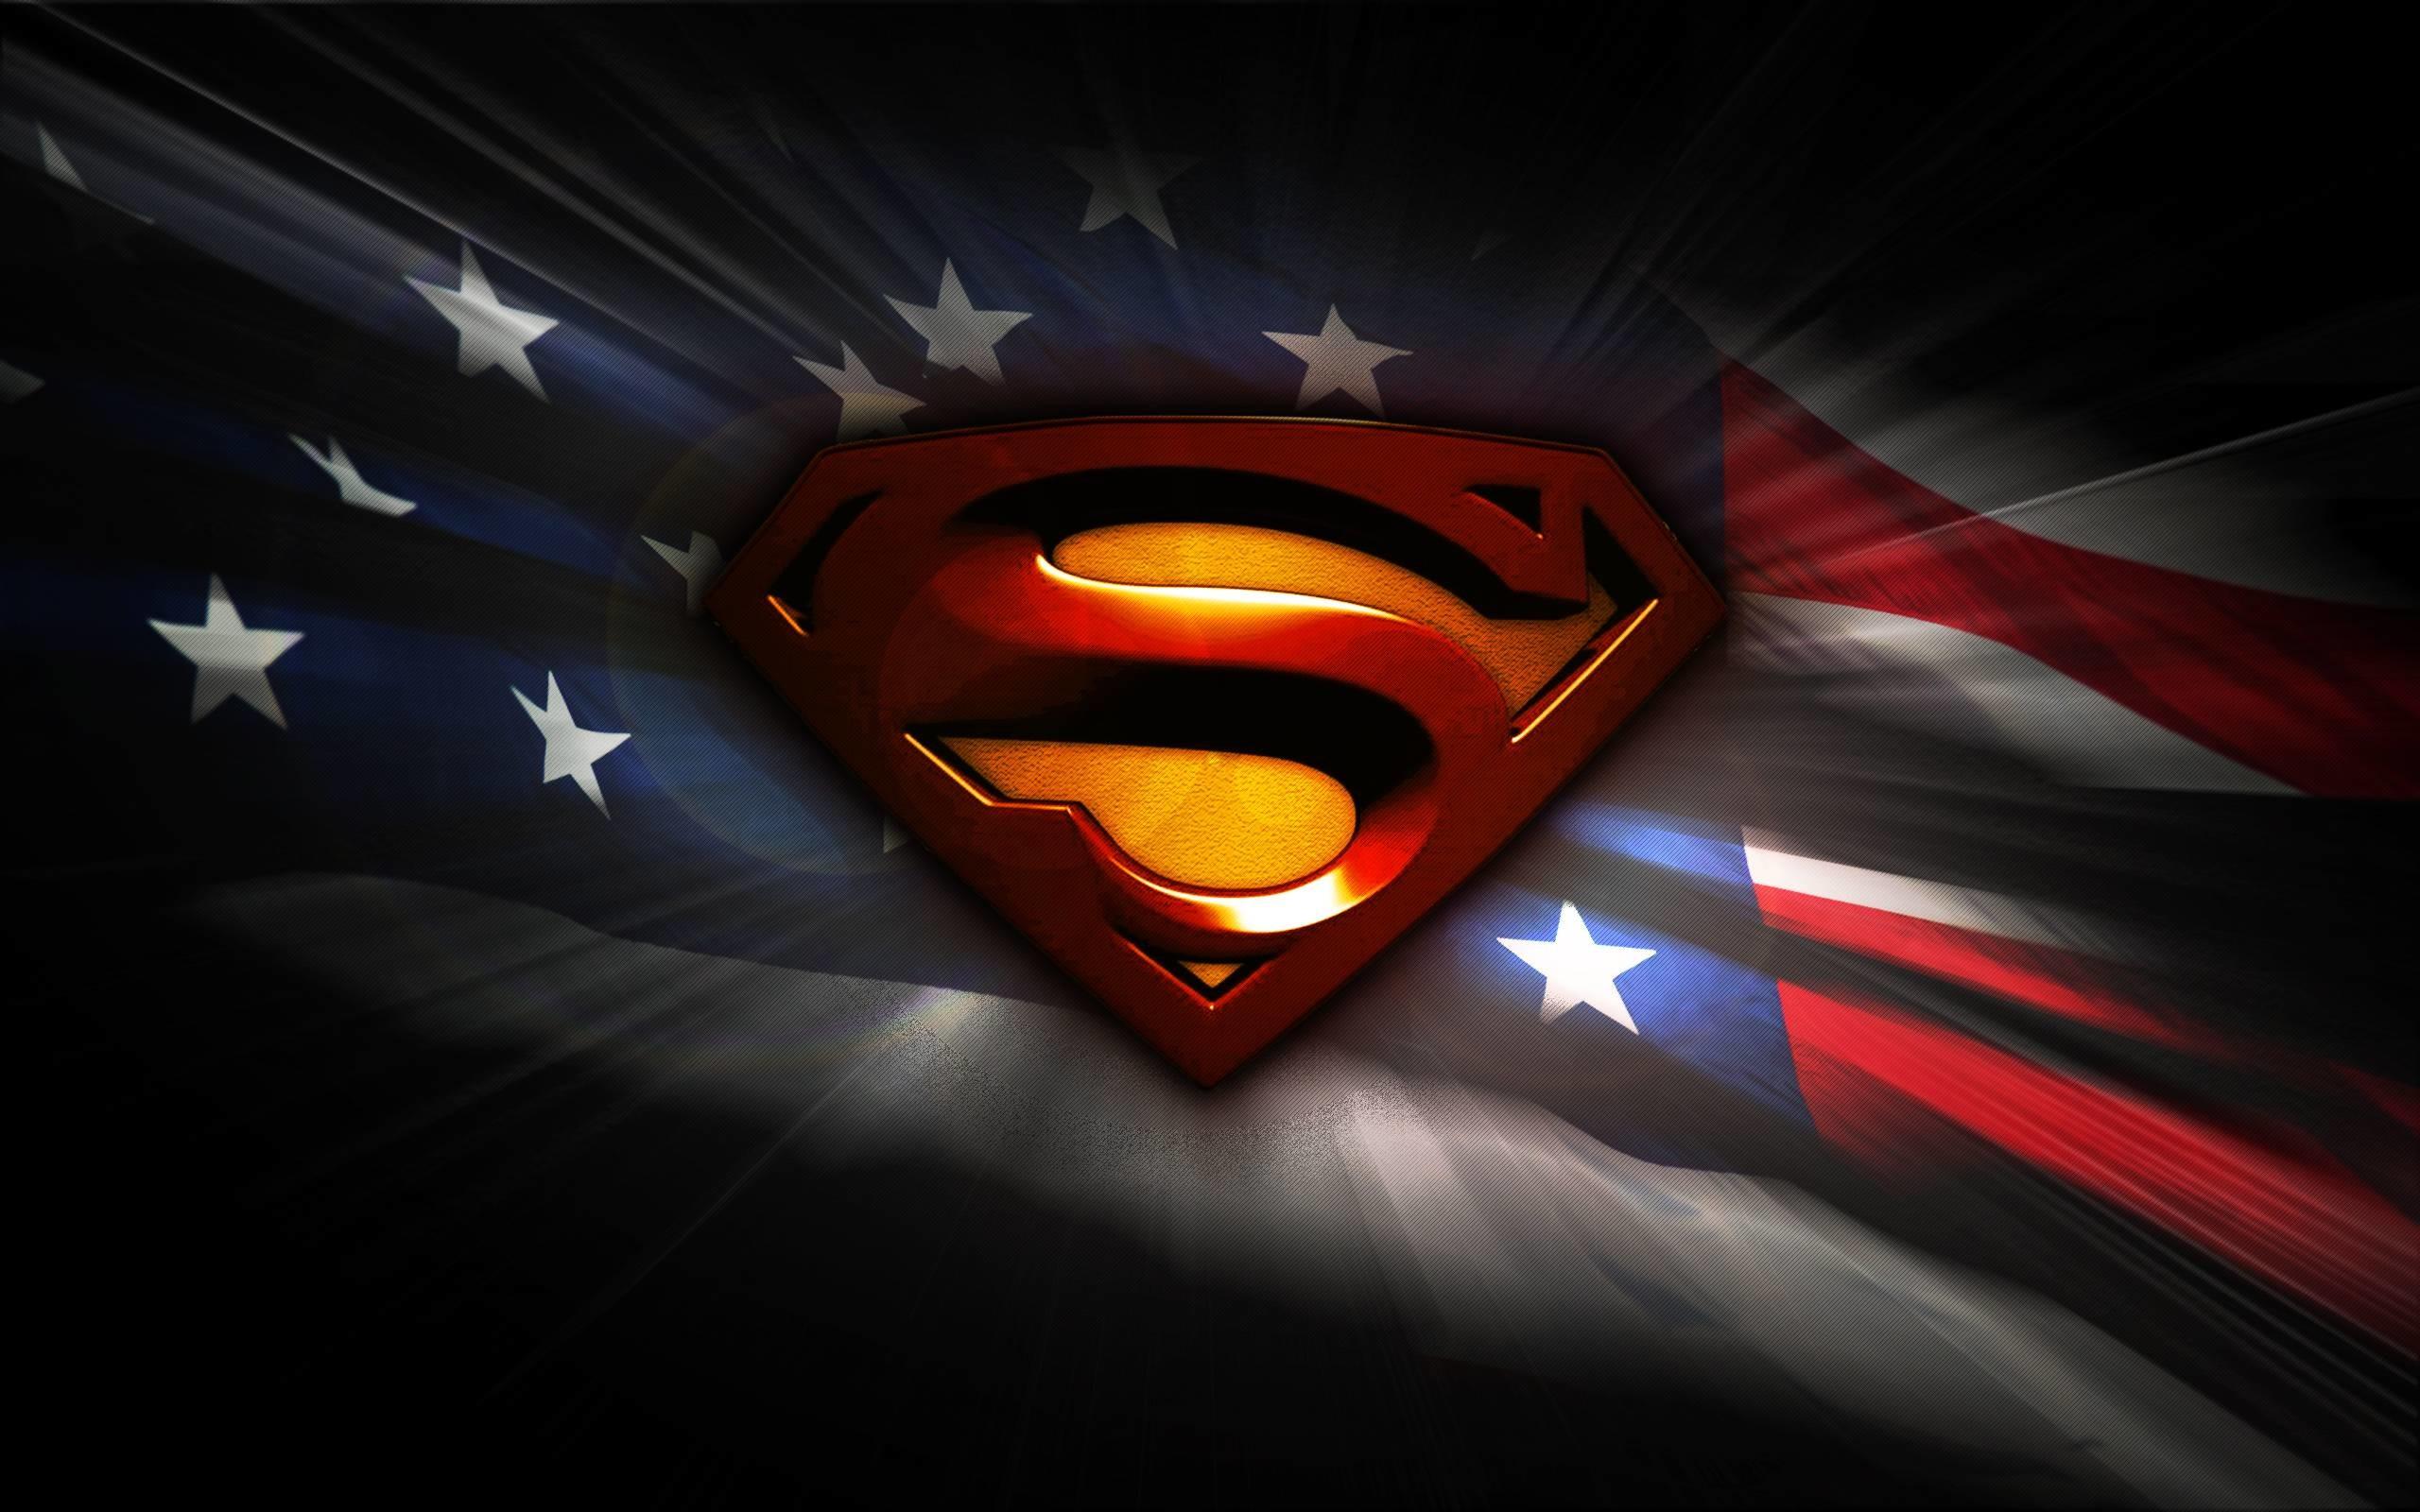 Superman Symbol HD Picture Wallpaper – HD Wallpapers